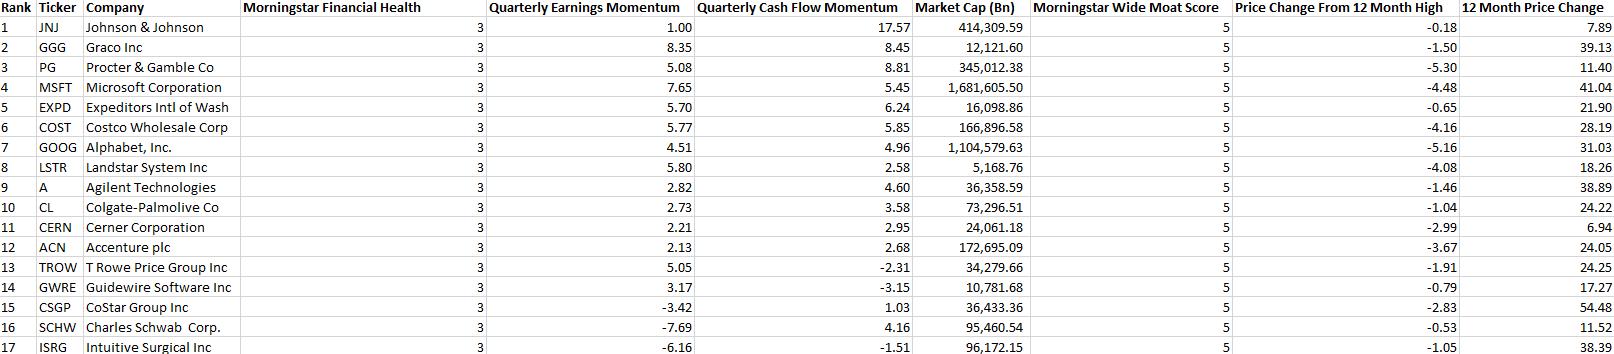 List of stock picks